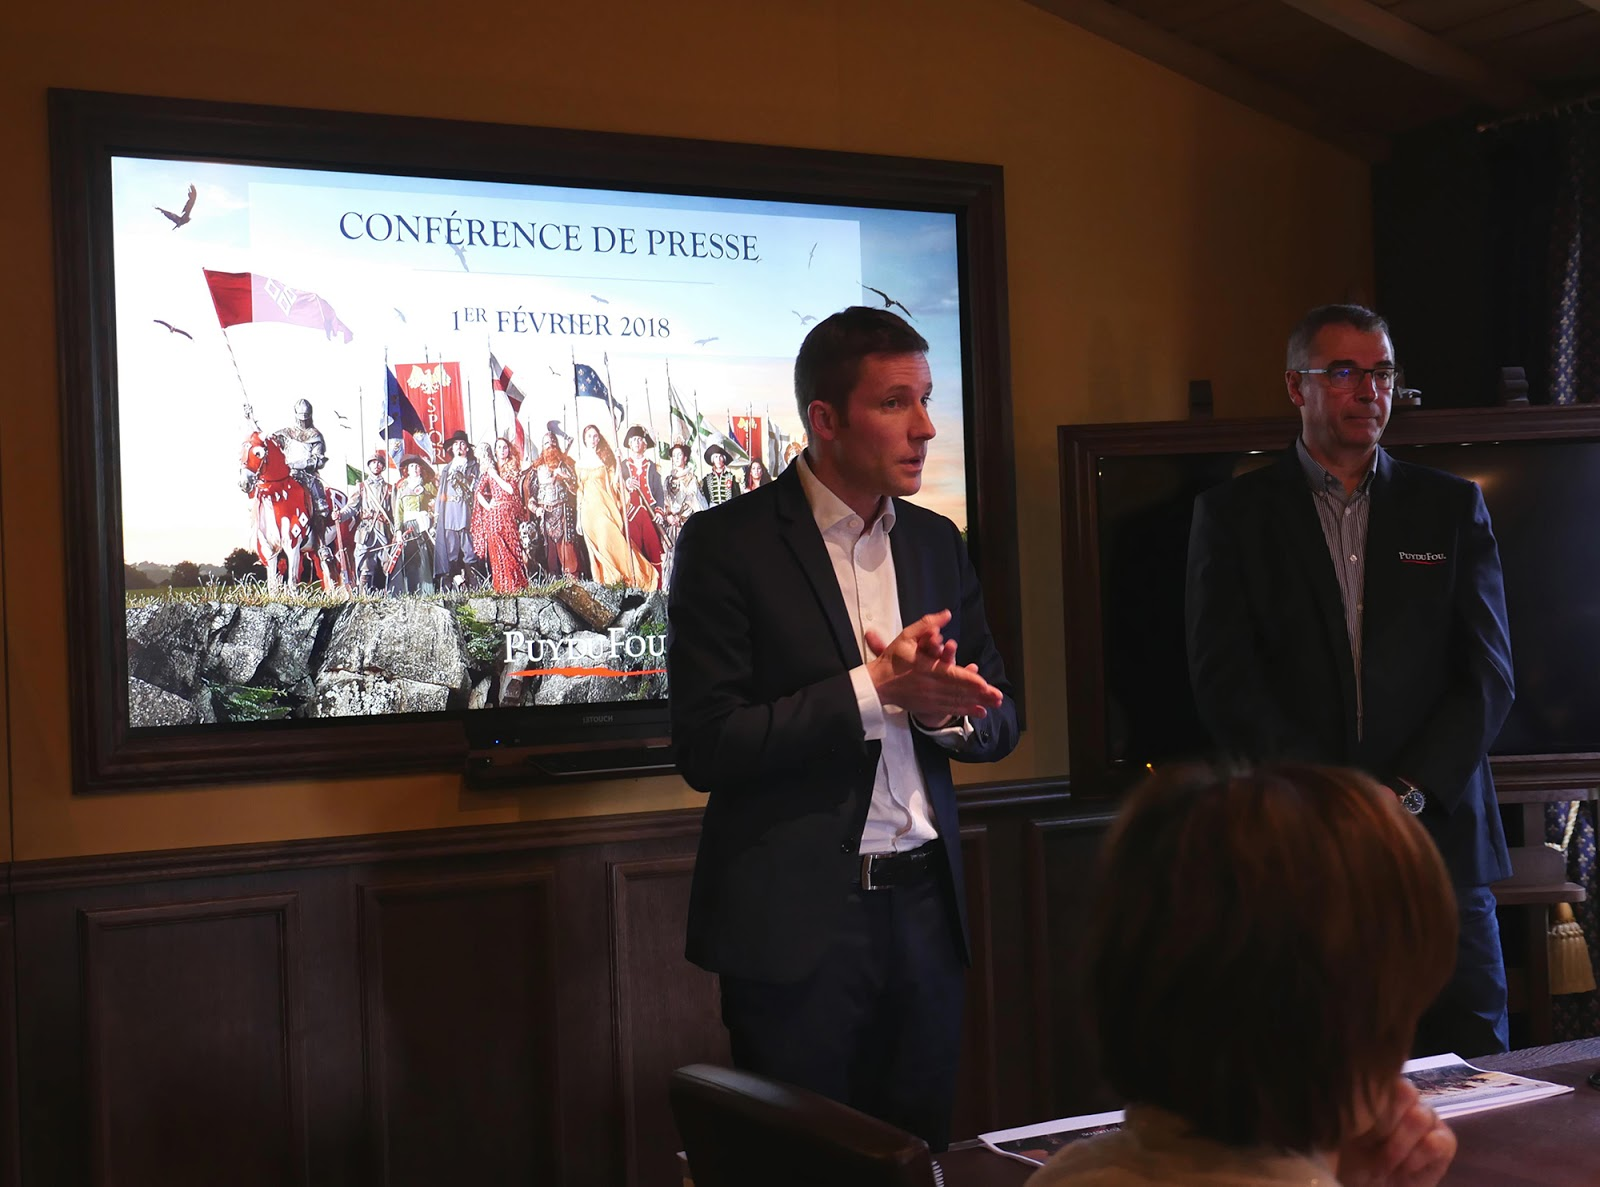 restaurant puy du fou noel 2018 ParcPlaza.net: Le Puy du Fou présente ses nouveautés 2018  restaurant puy du fou noel 2018